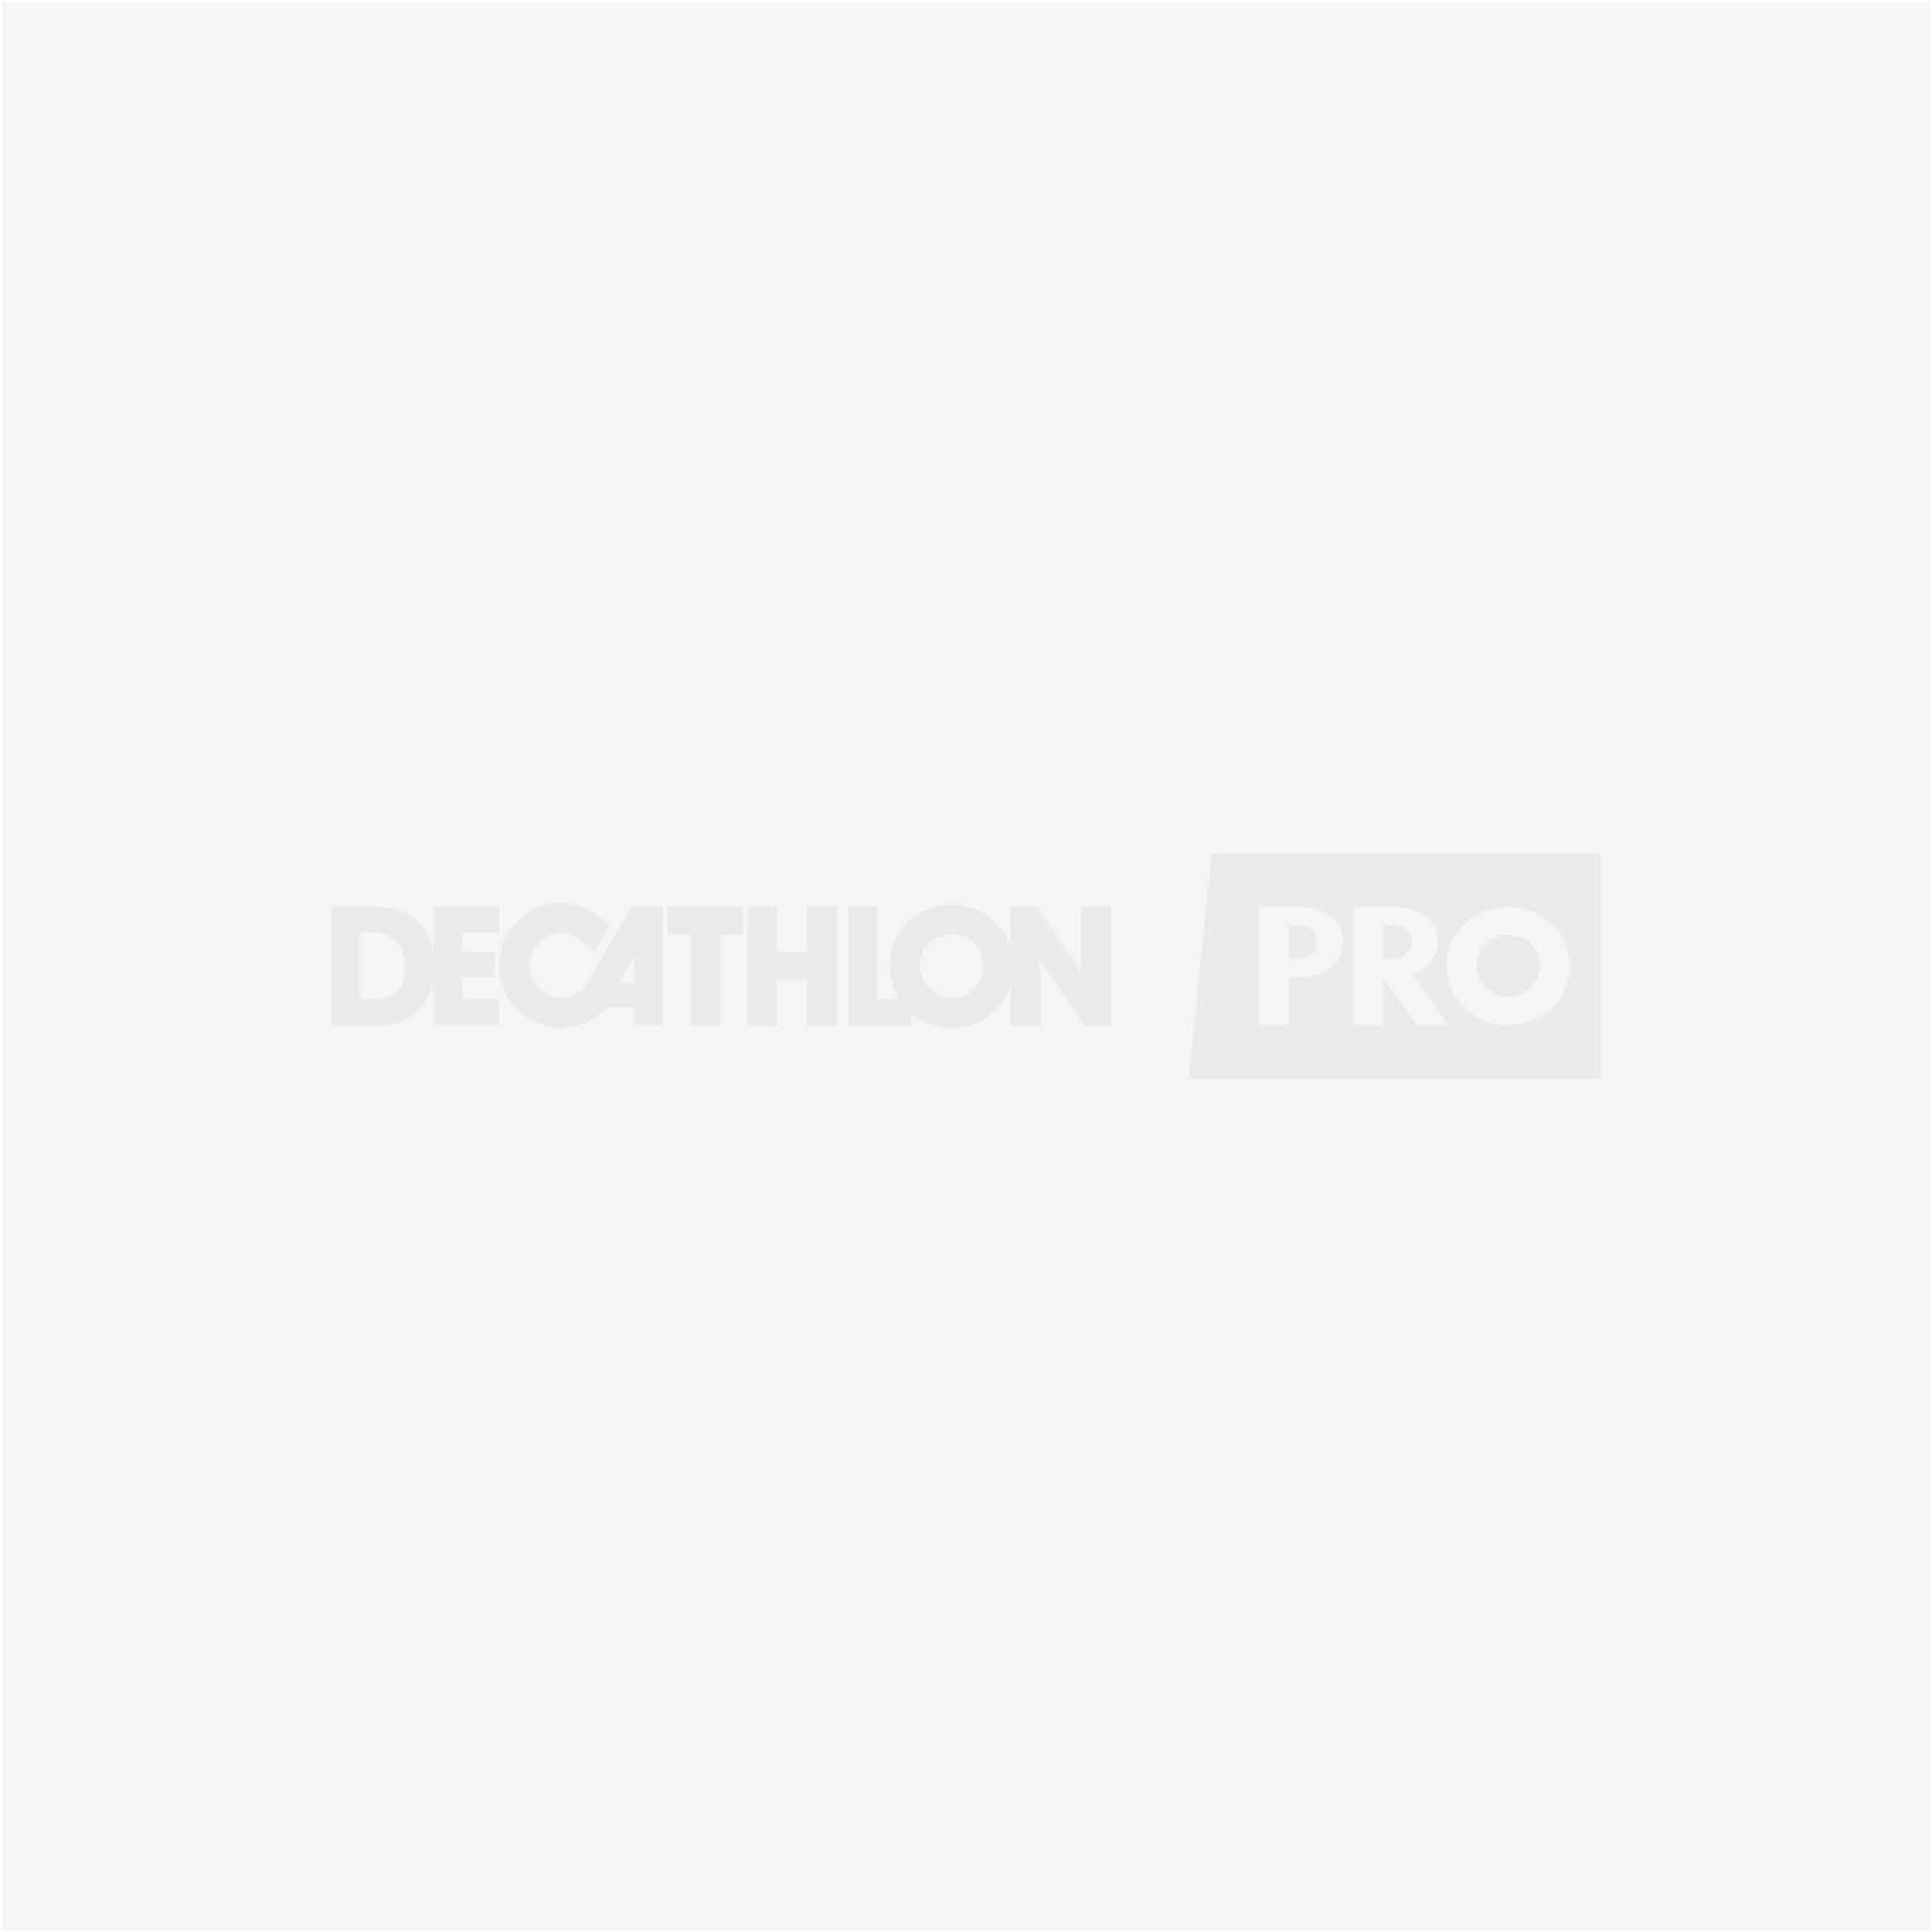 Rejoignez la team Decathlon Pro